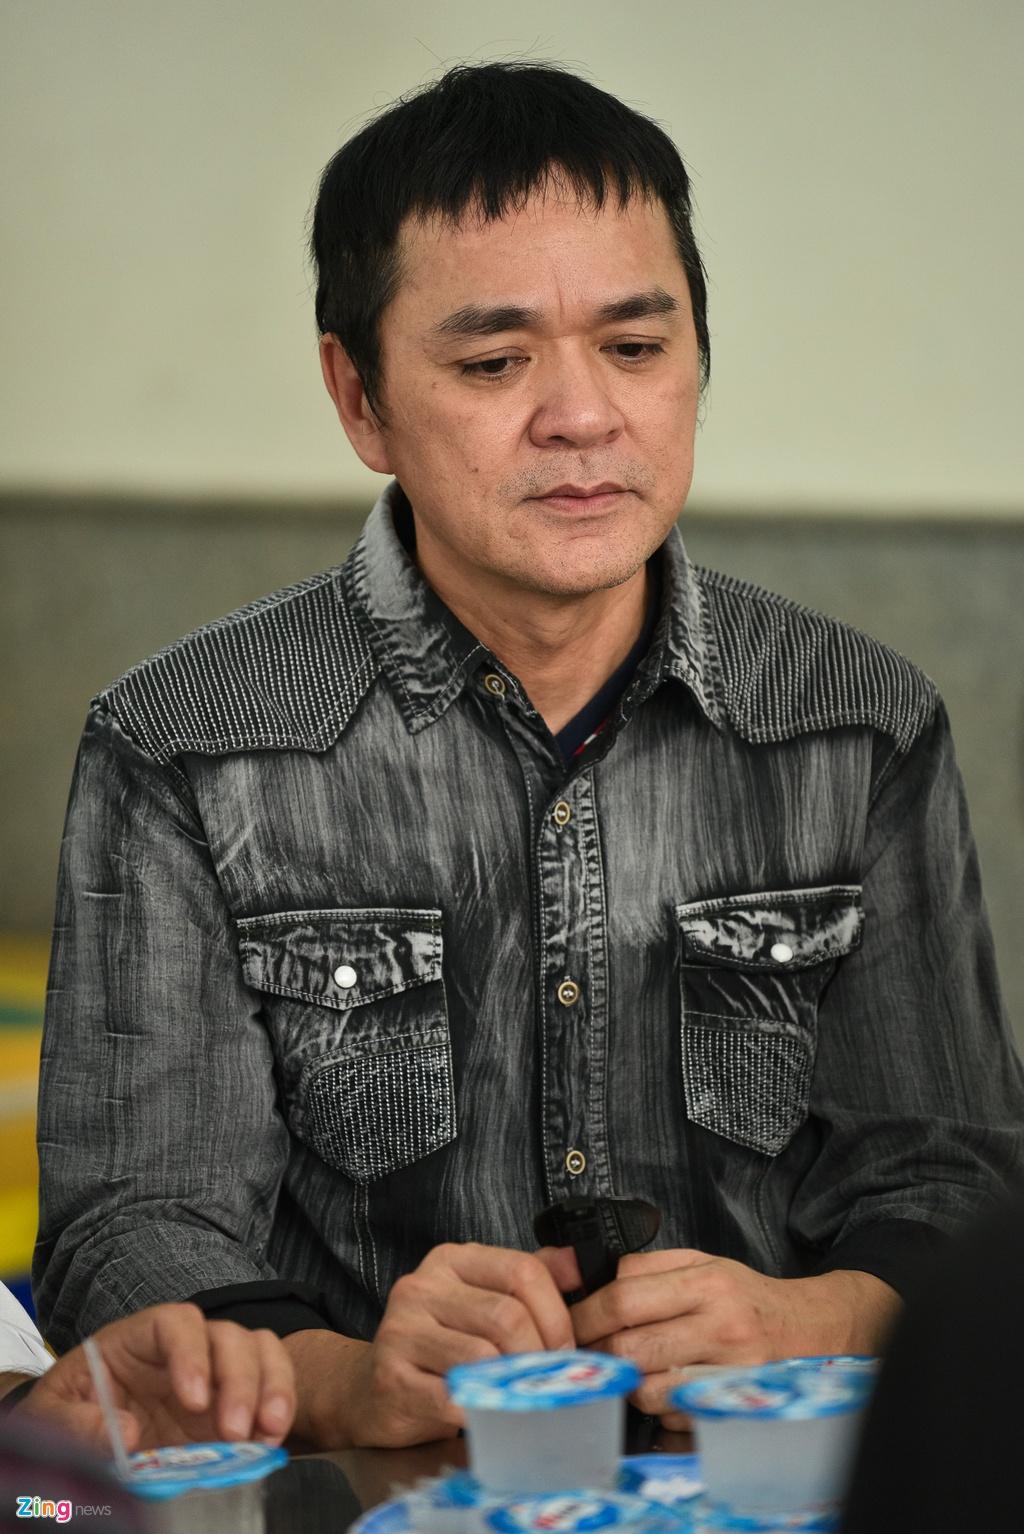 Con trai NSUT Thanh Hoang oa khoc khi ve nuoc chiu tang cha hinh anh 15